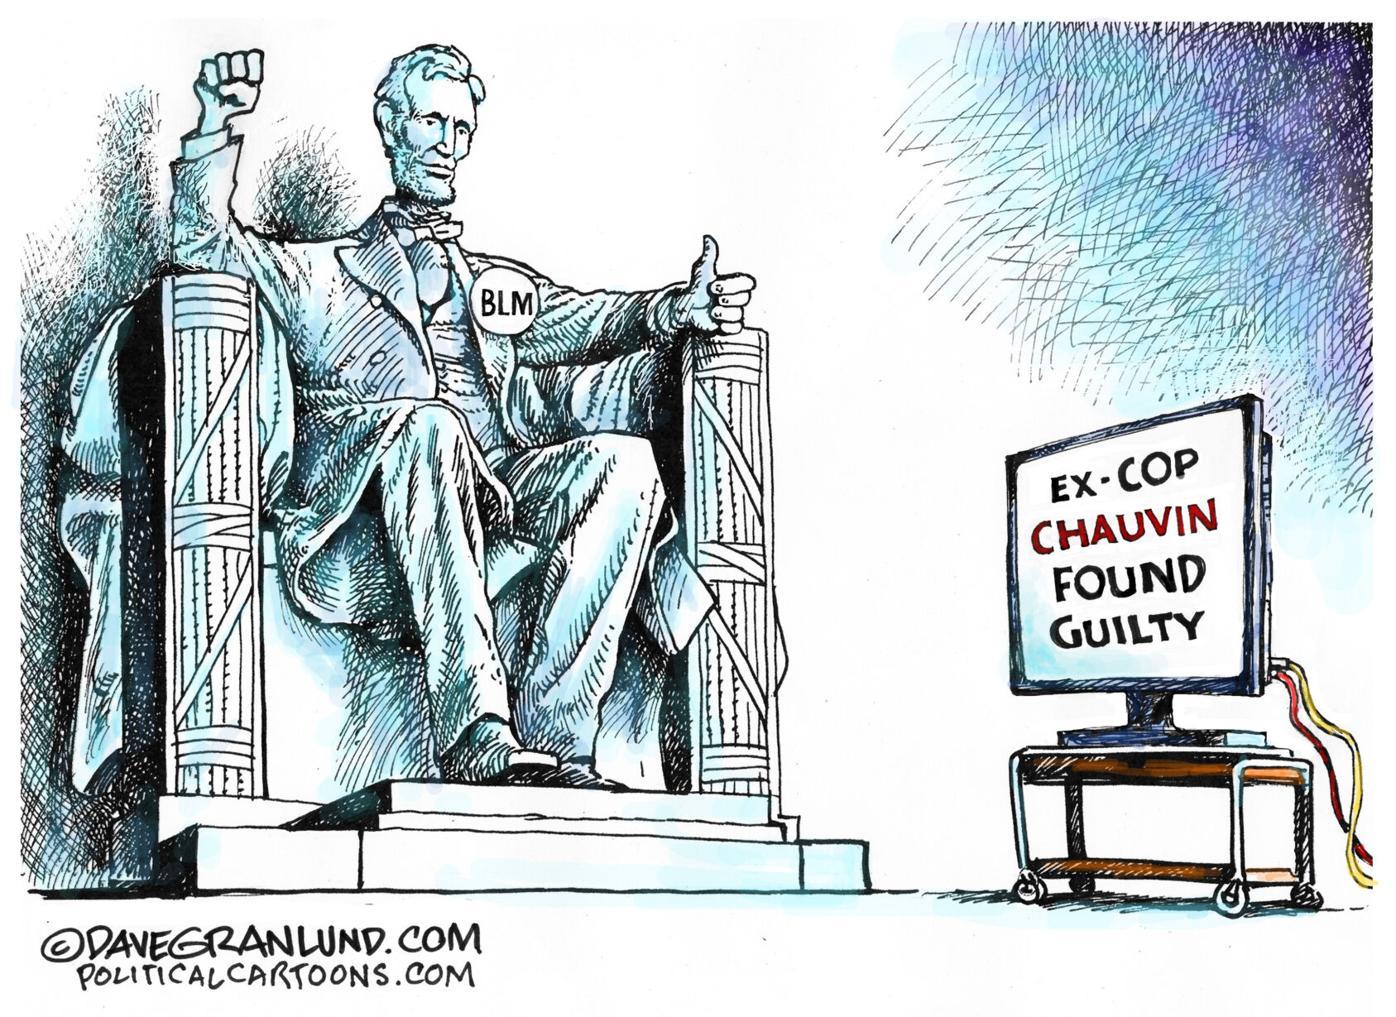 Political cartoons: The Derek Chauvin verdict